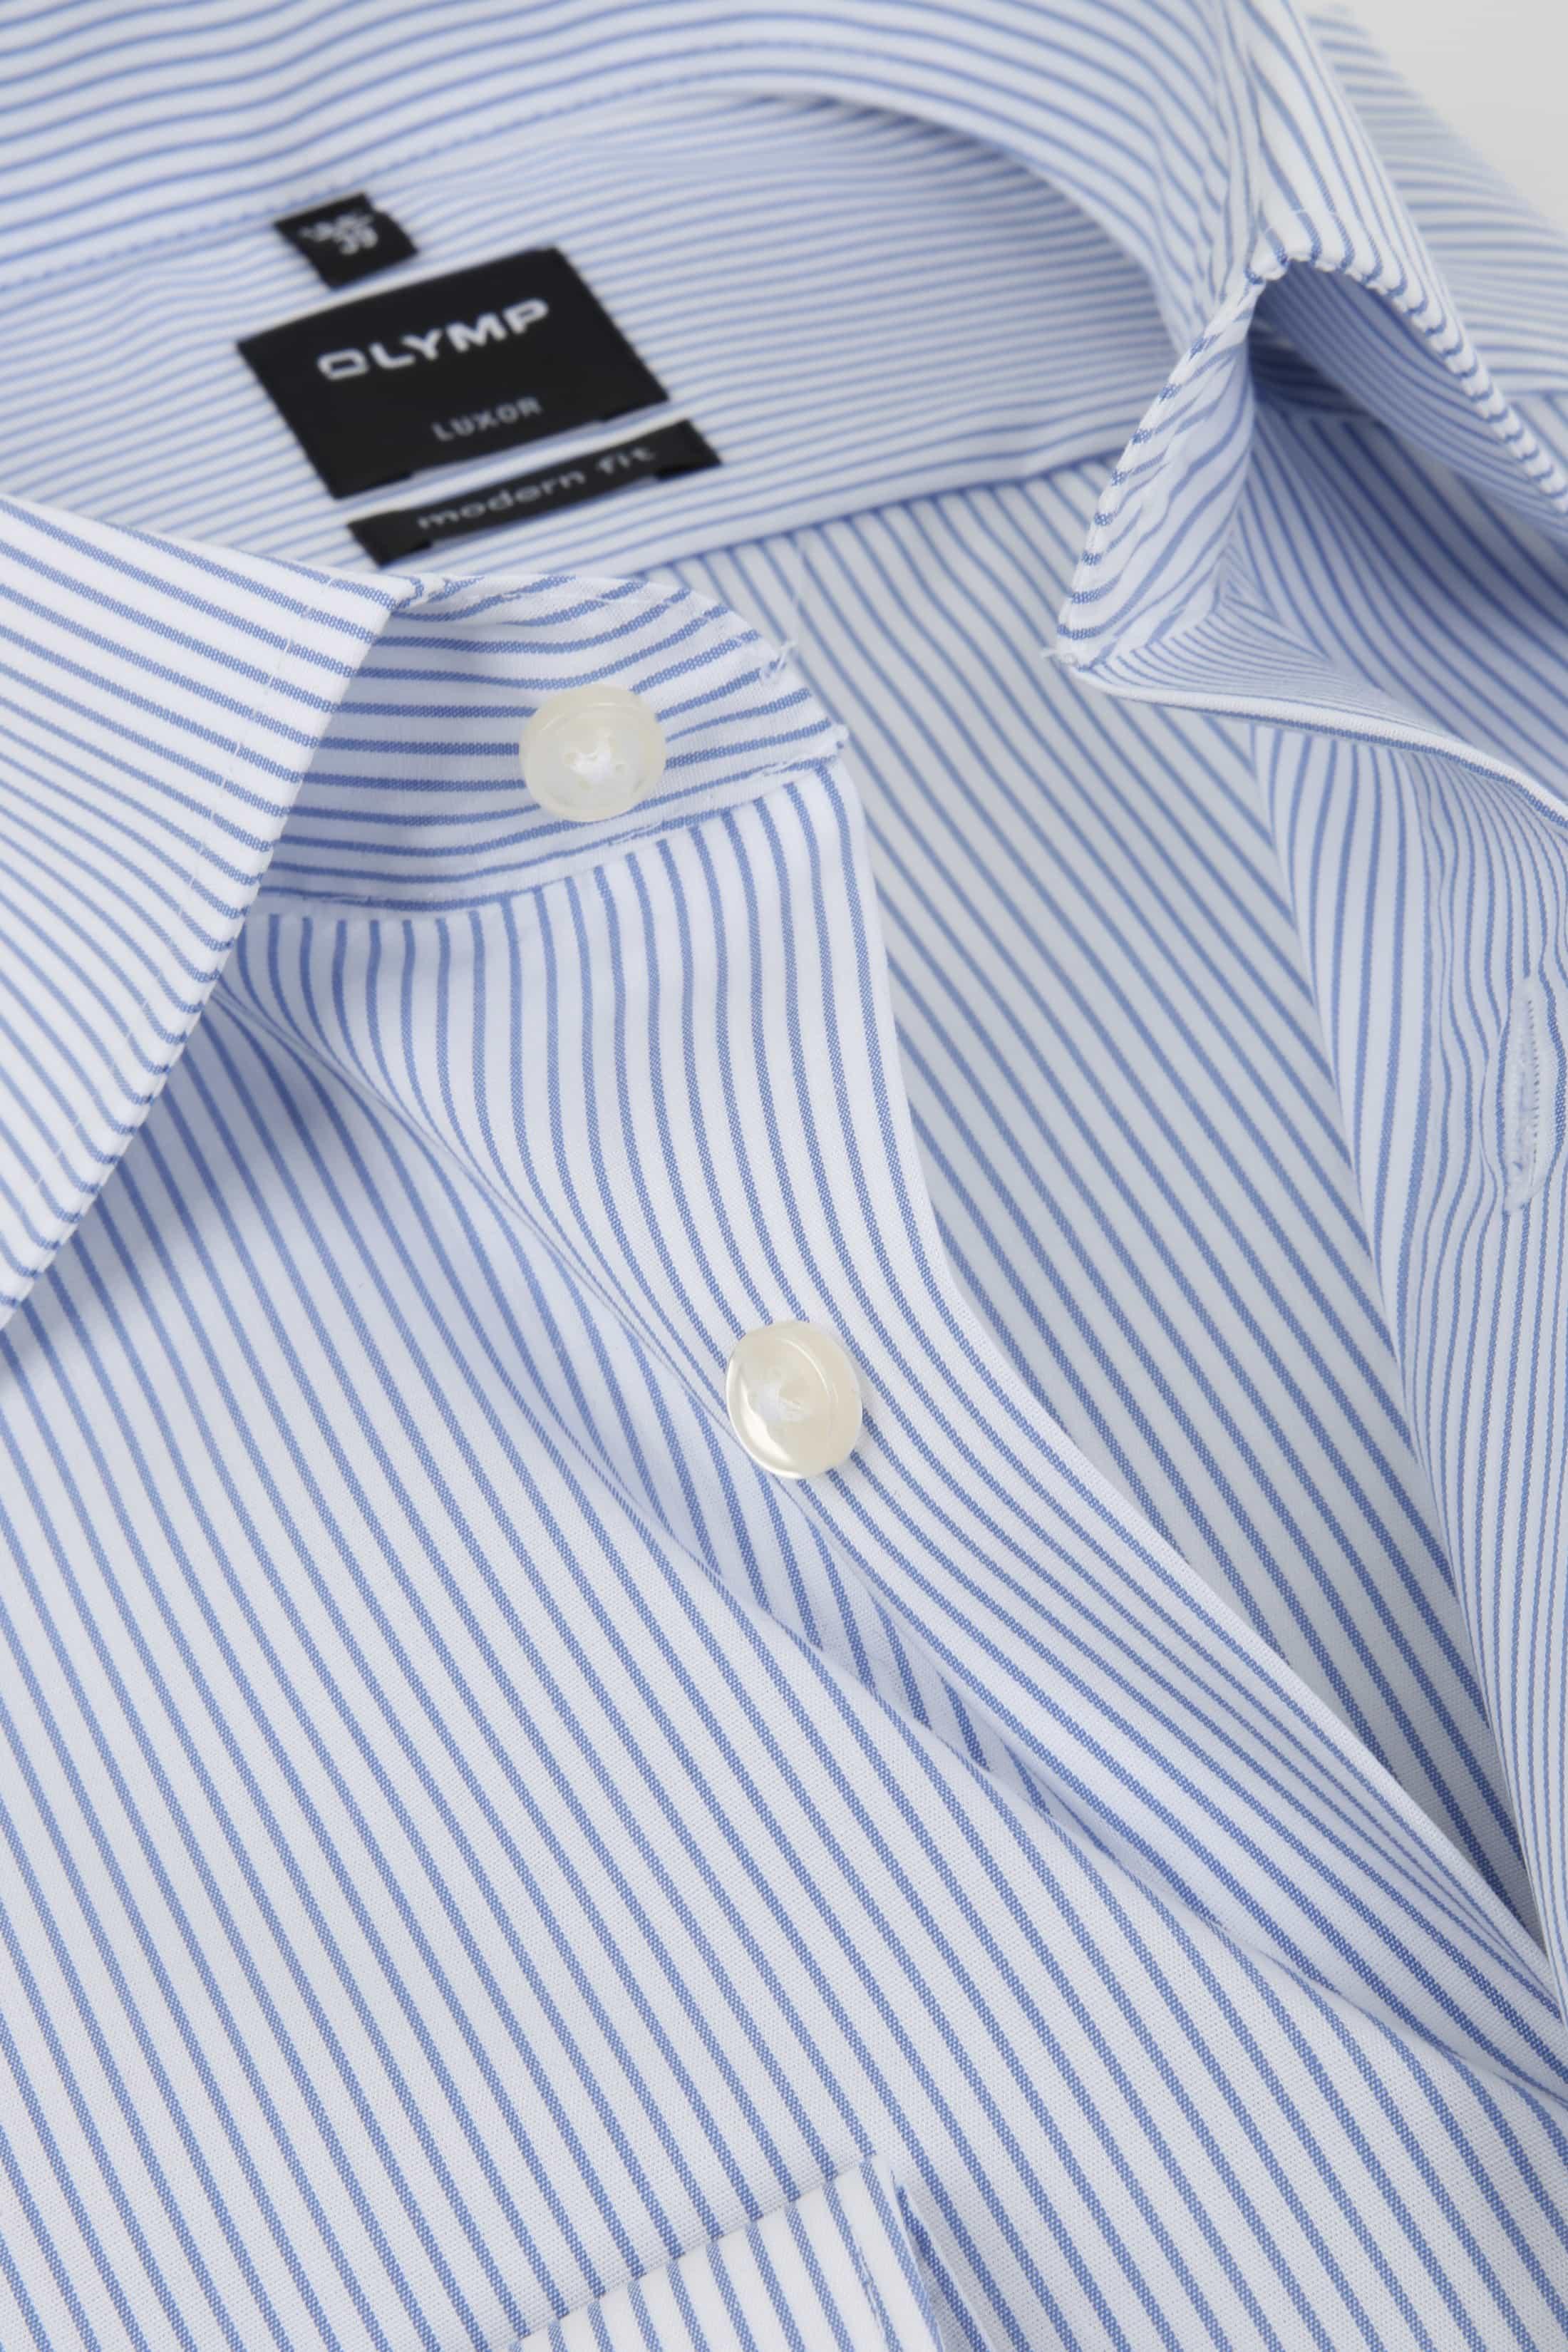 huge discount acaf3 a5ecc OLYMP Luxor Hemd Slim Line White Blue Stripe